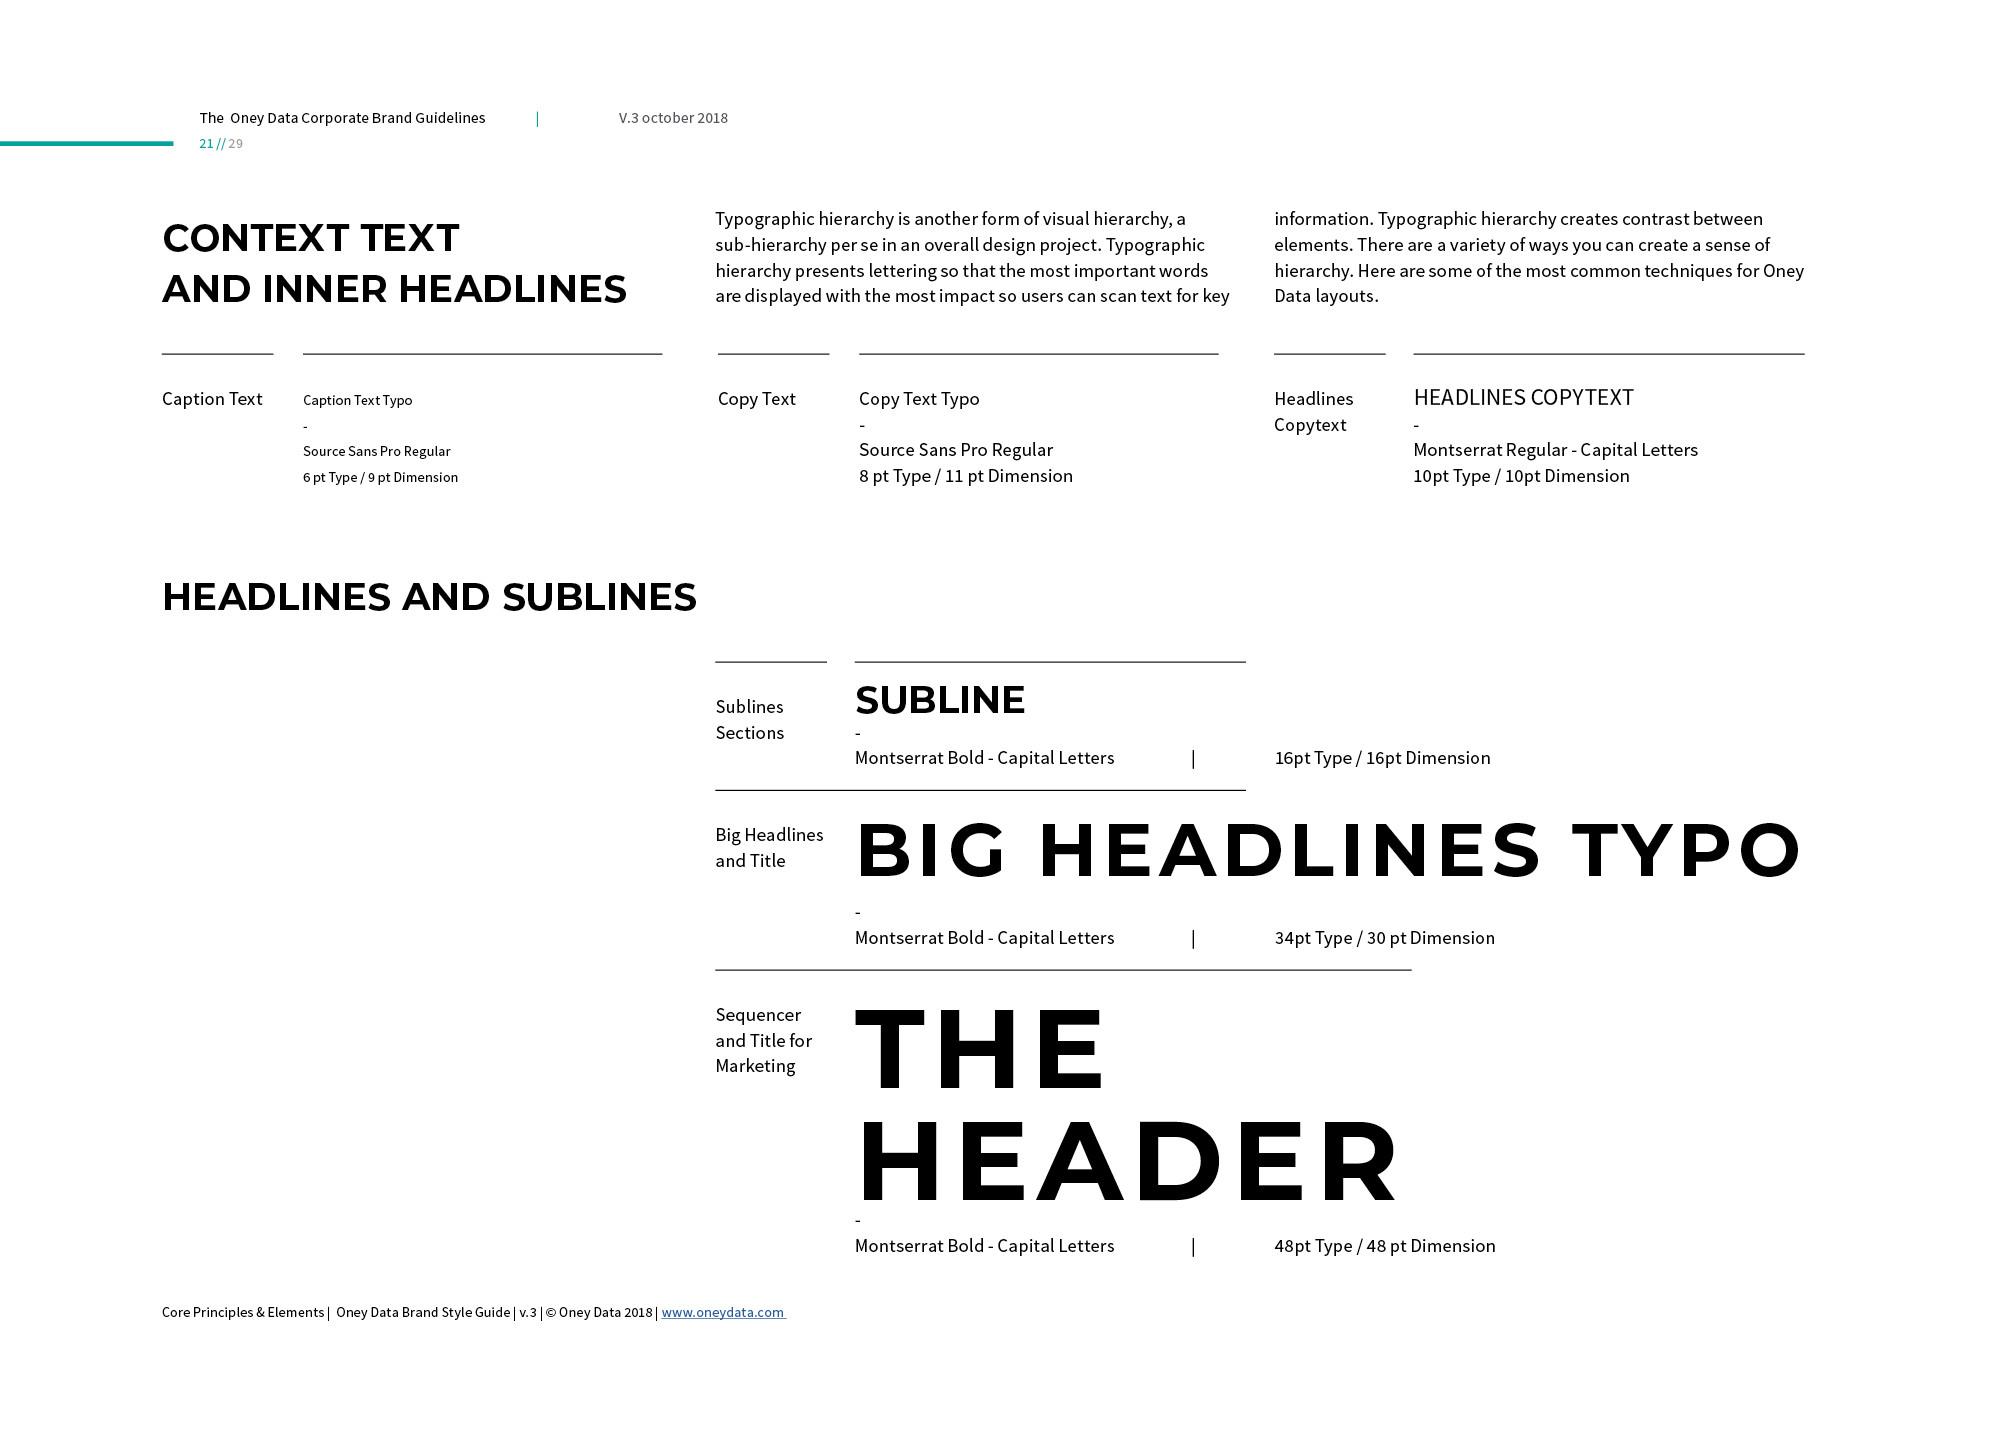 Guideline manual design